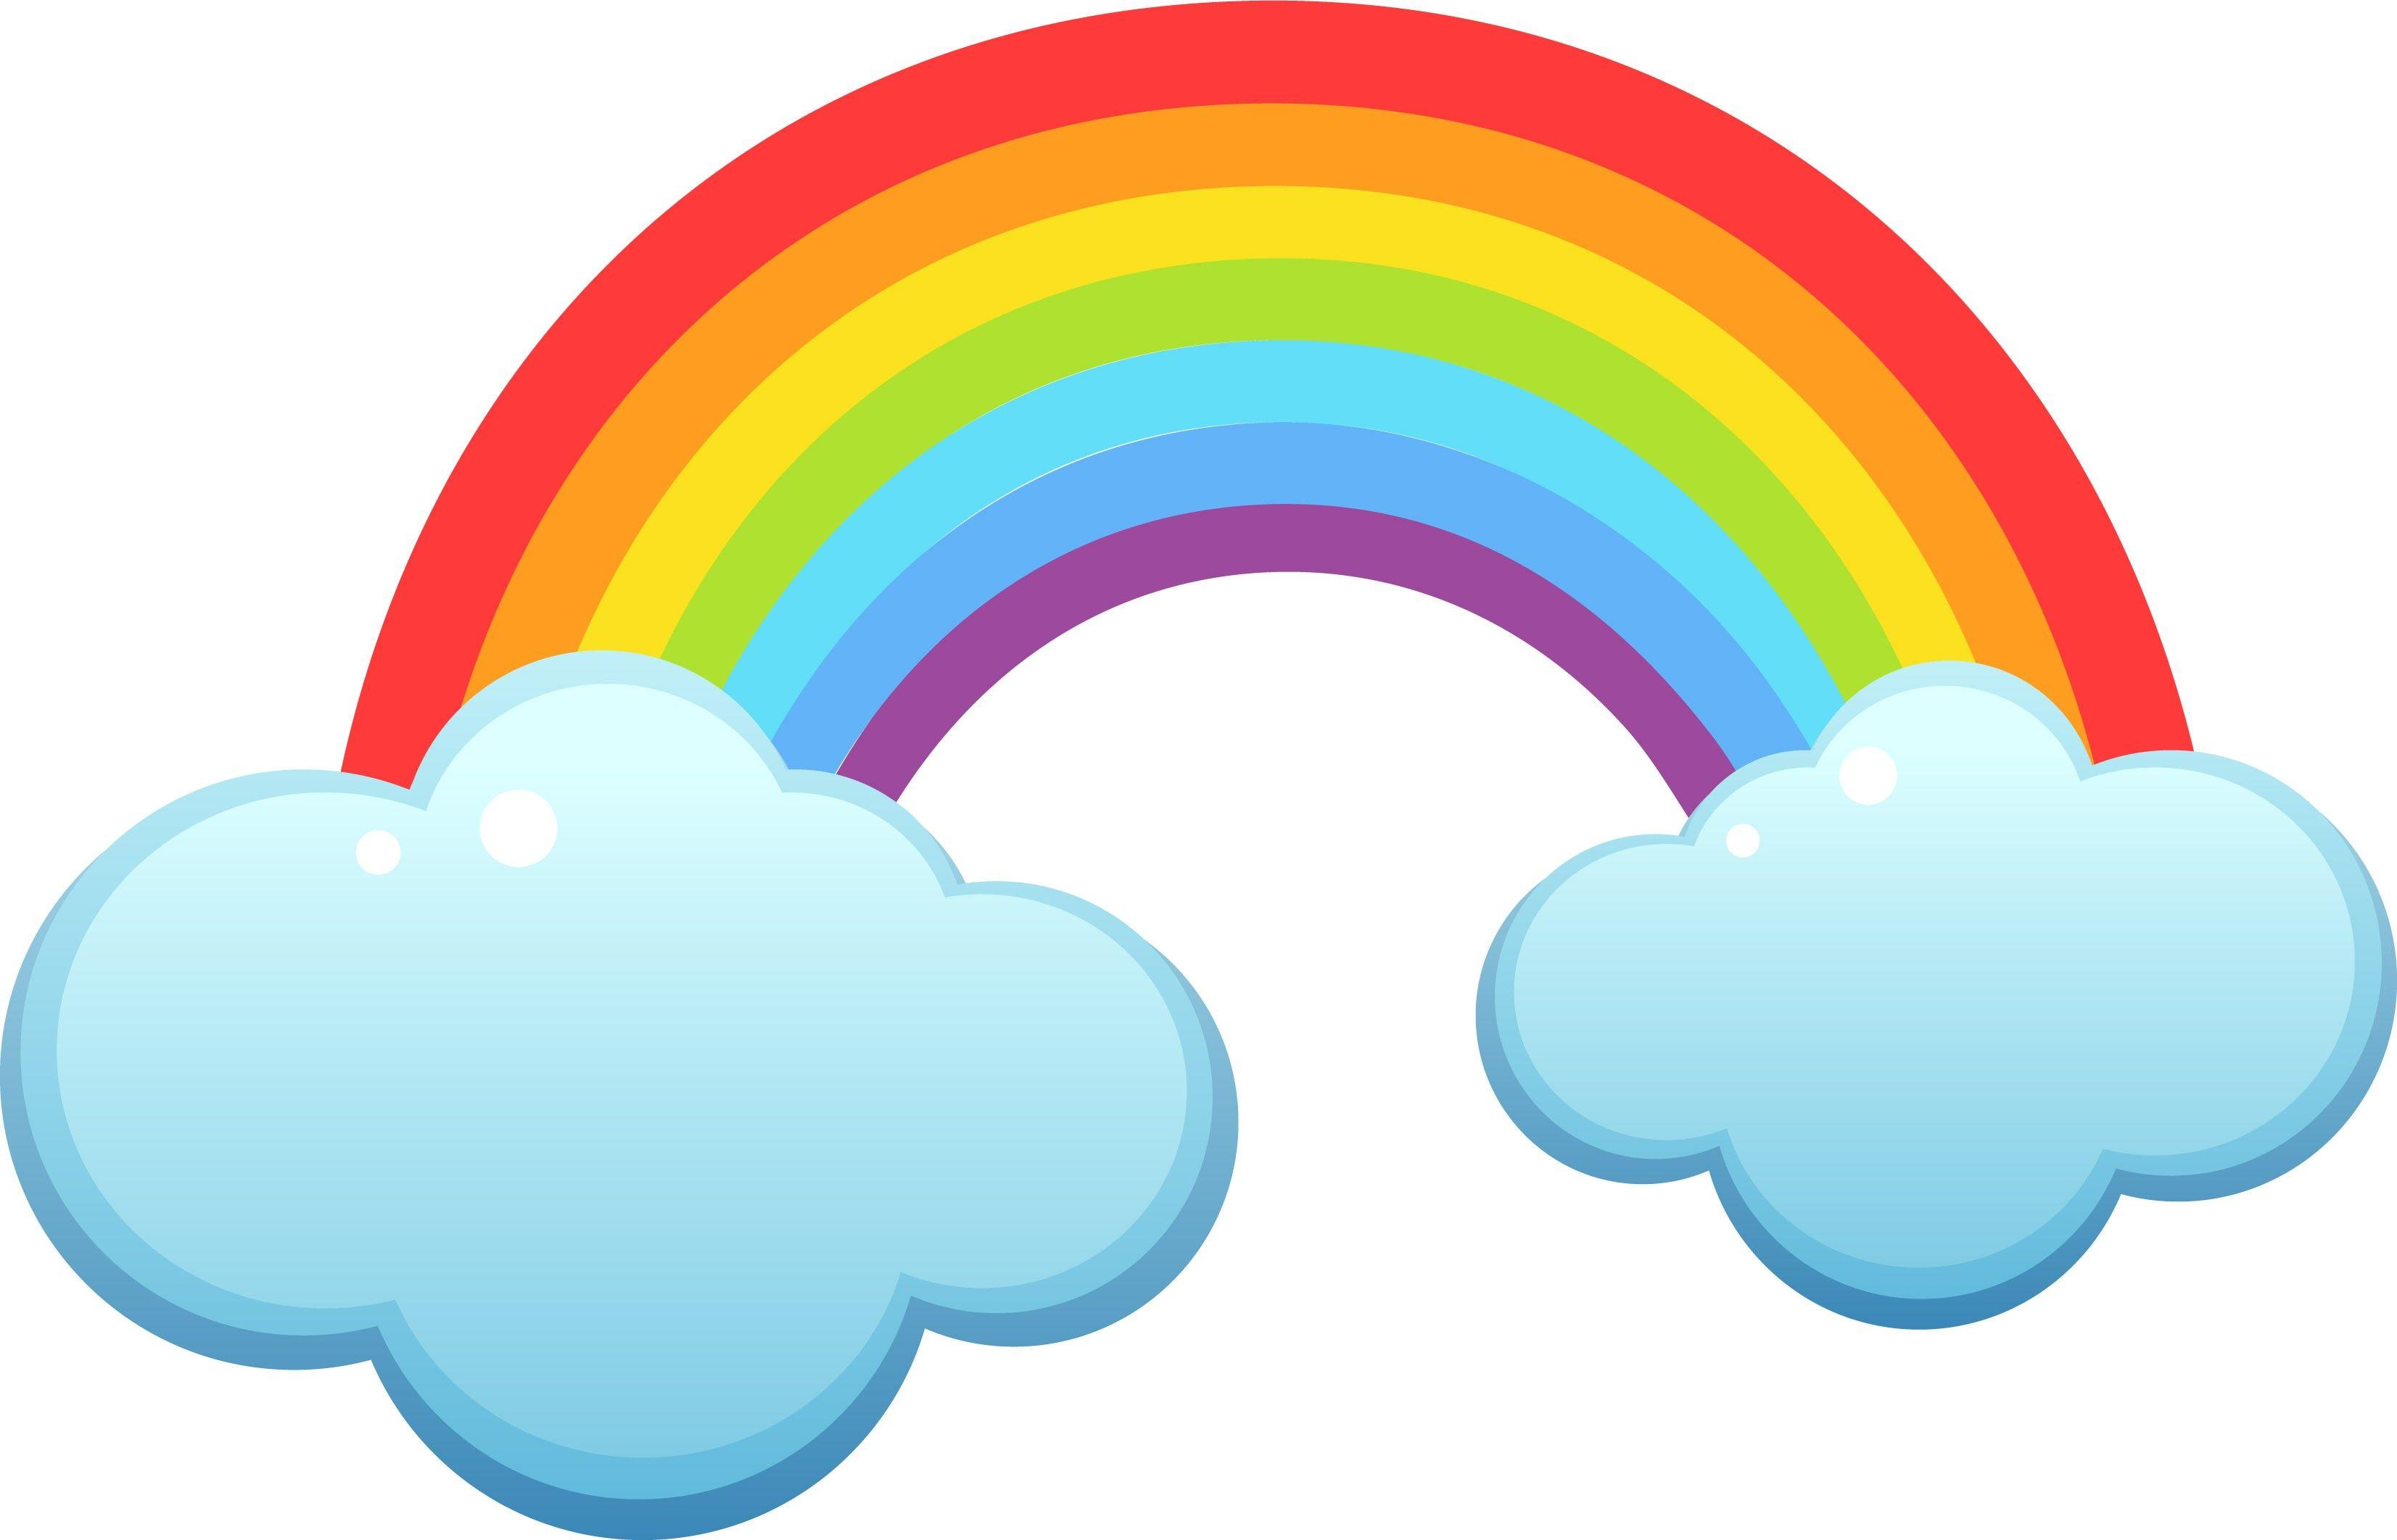 cute rainbow illustration google search clipart pinterest rh pinterest co uk rainbow clipart vector rainbow clip art free images